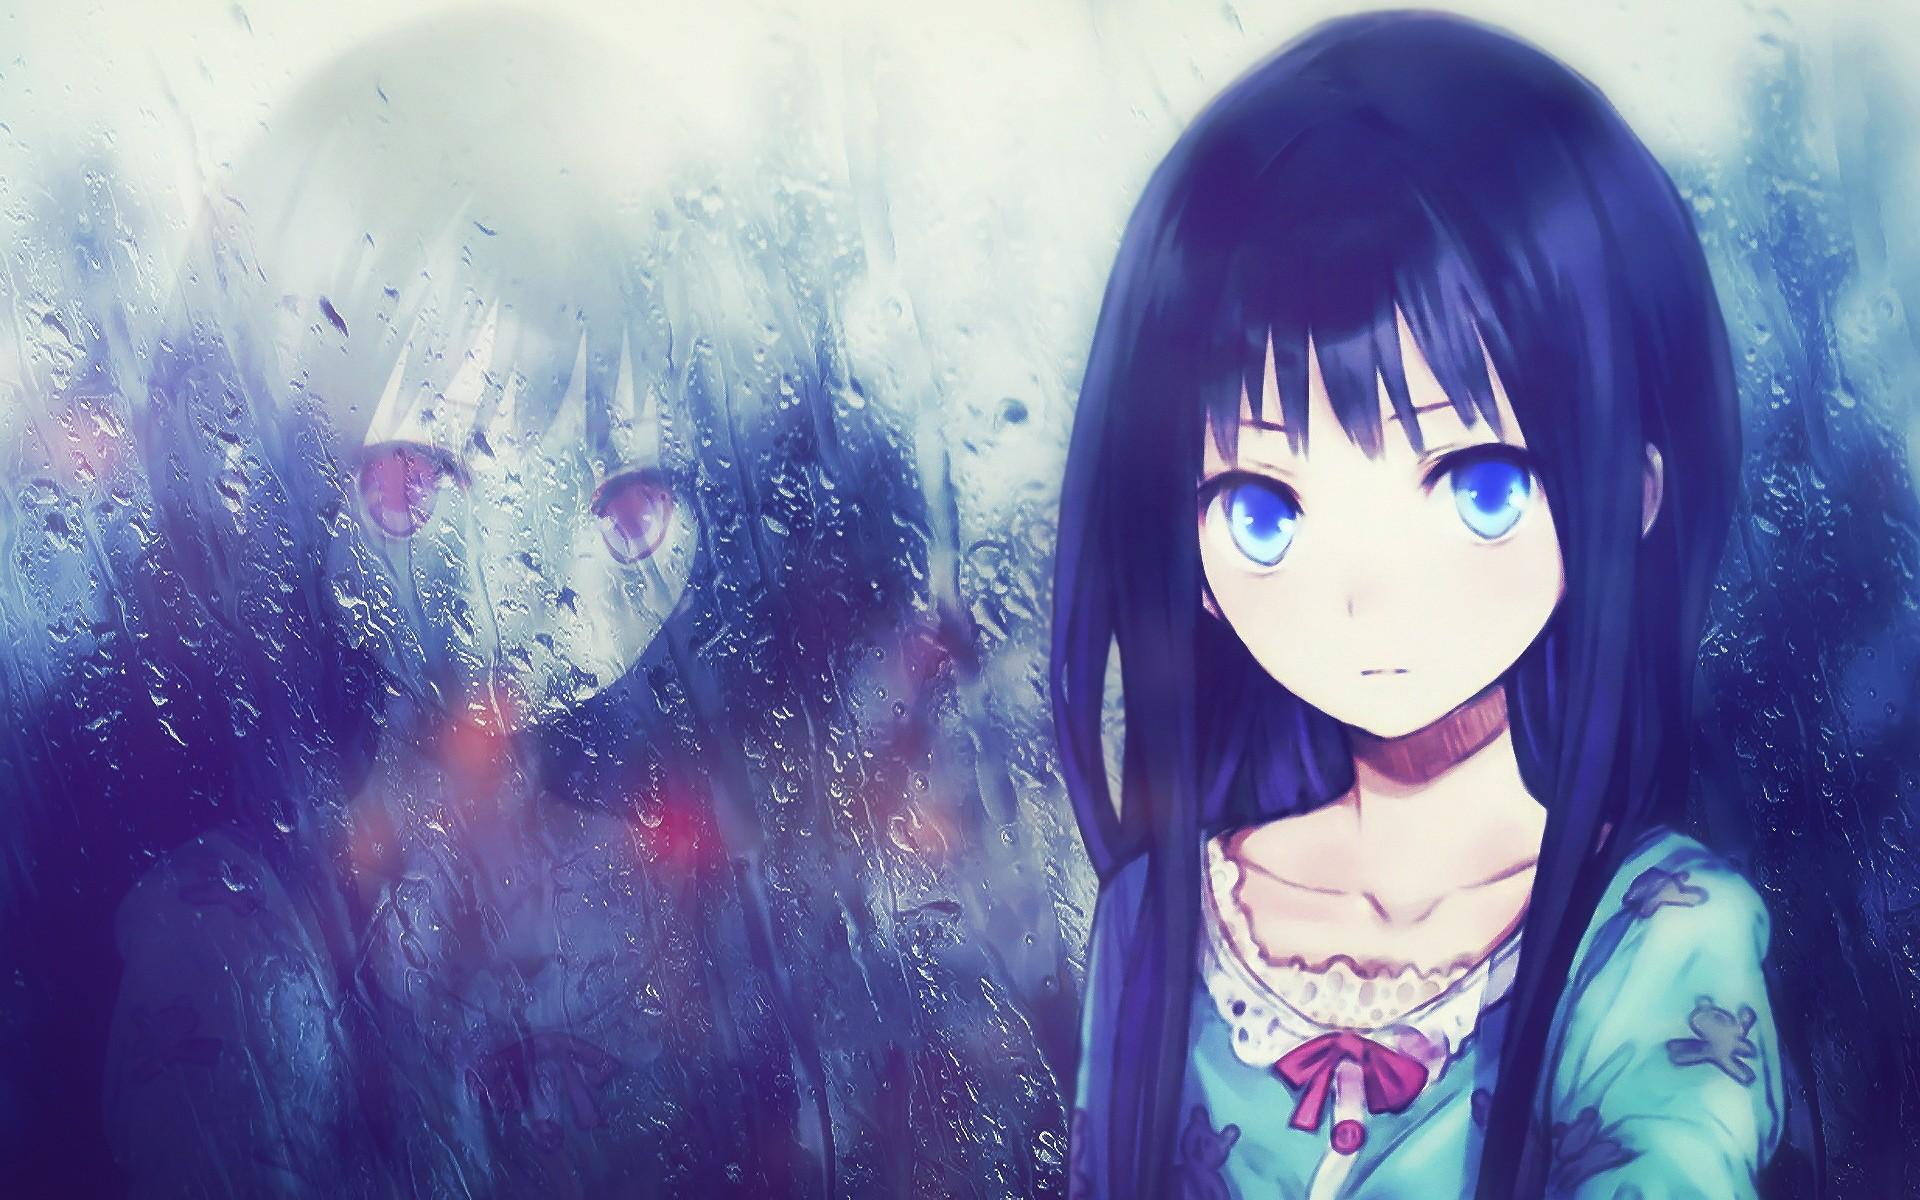 Anime Girls wallpaper \u00b7\u2460 Download free beautiful